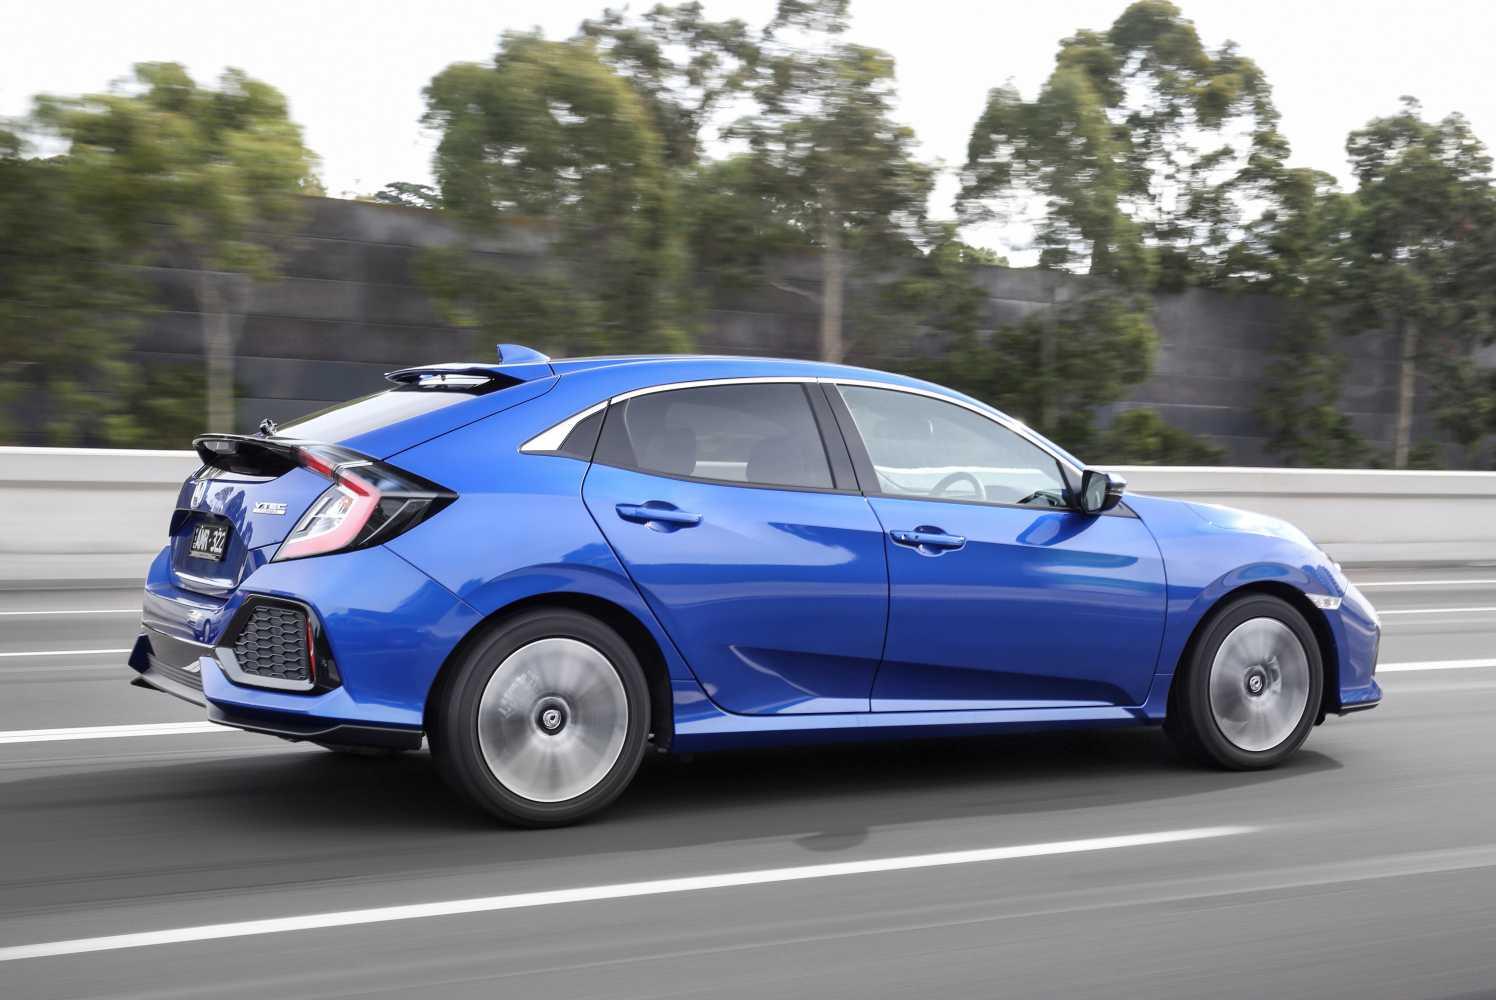 2017 Honda Lineup >> 2017 Honda Civic Hatch Joins The Lineup Carconversation